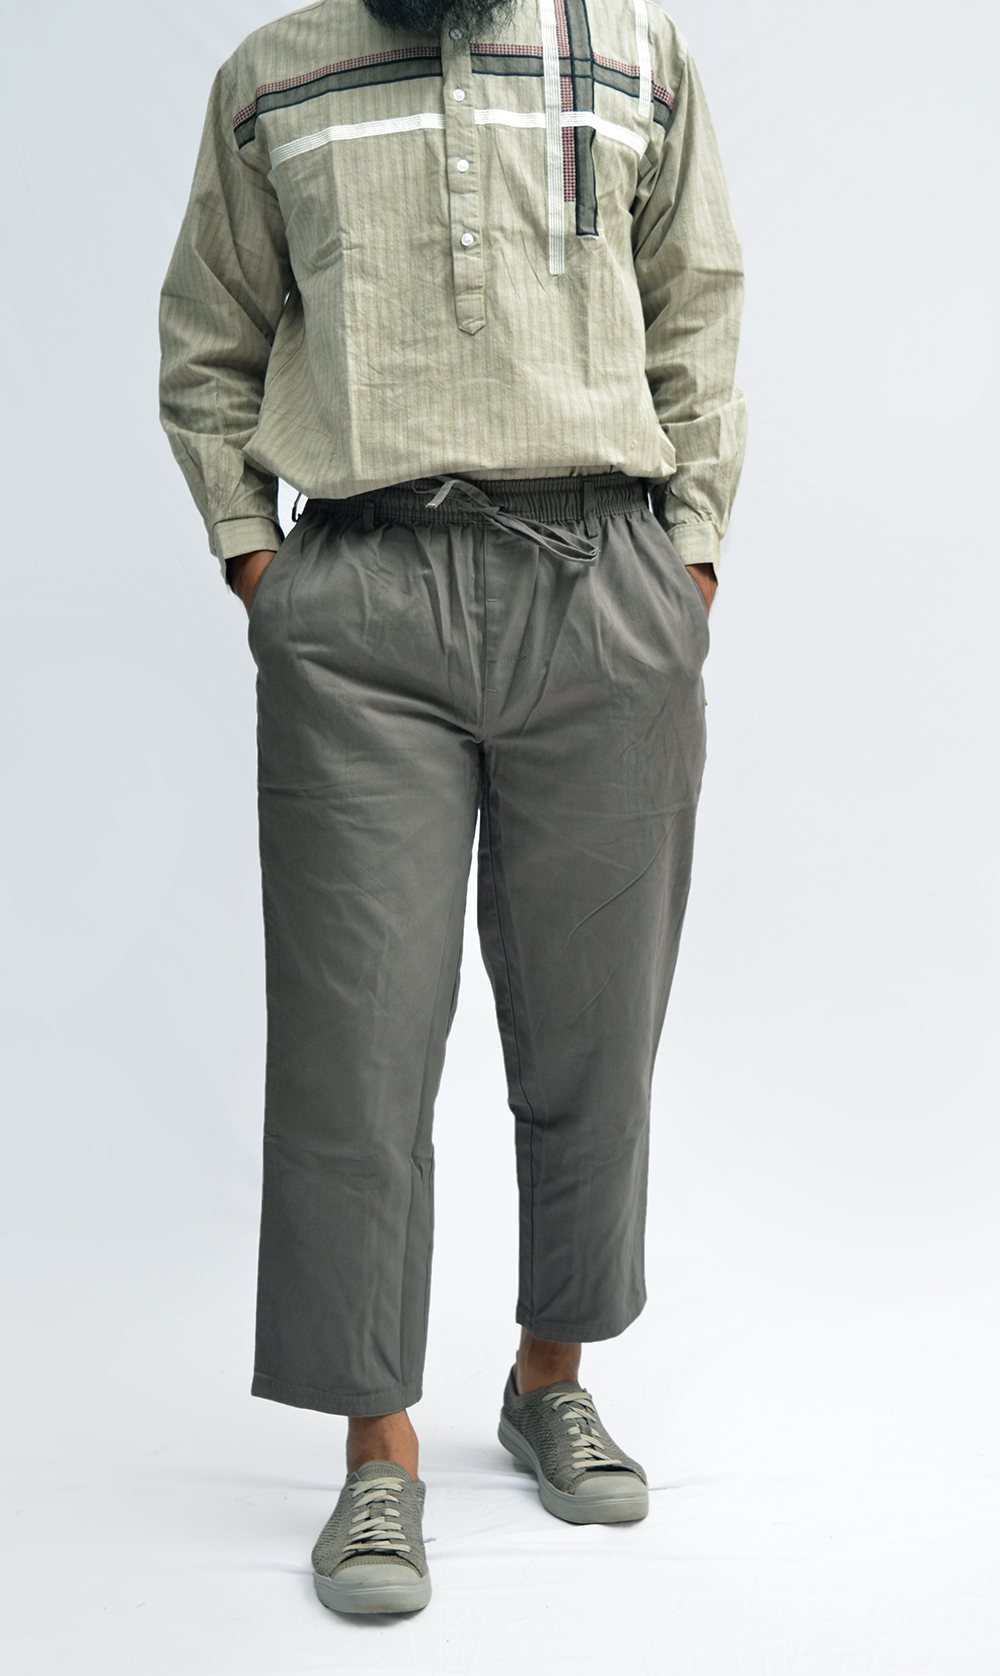 CS-007 Celana Sirwal Abu-abu Muda